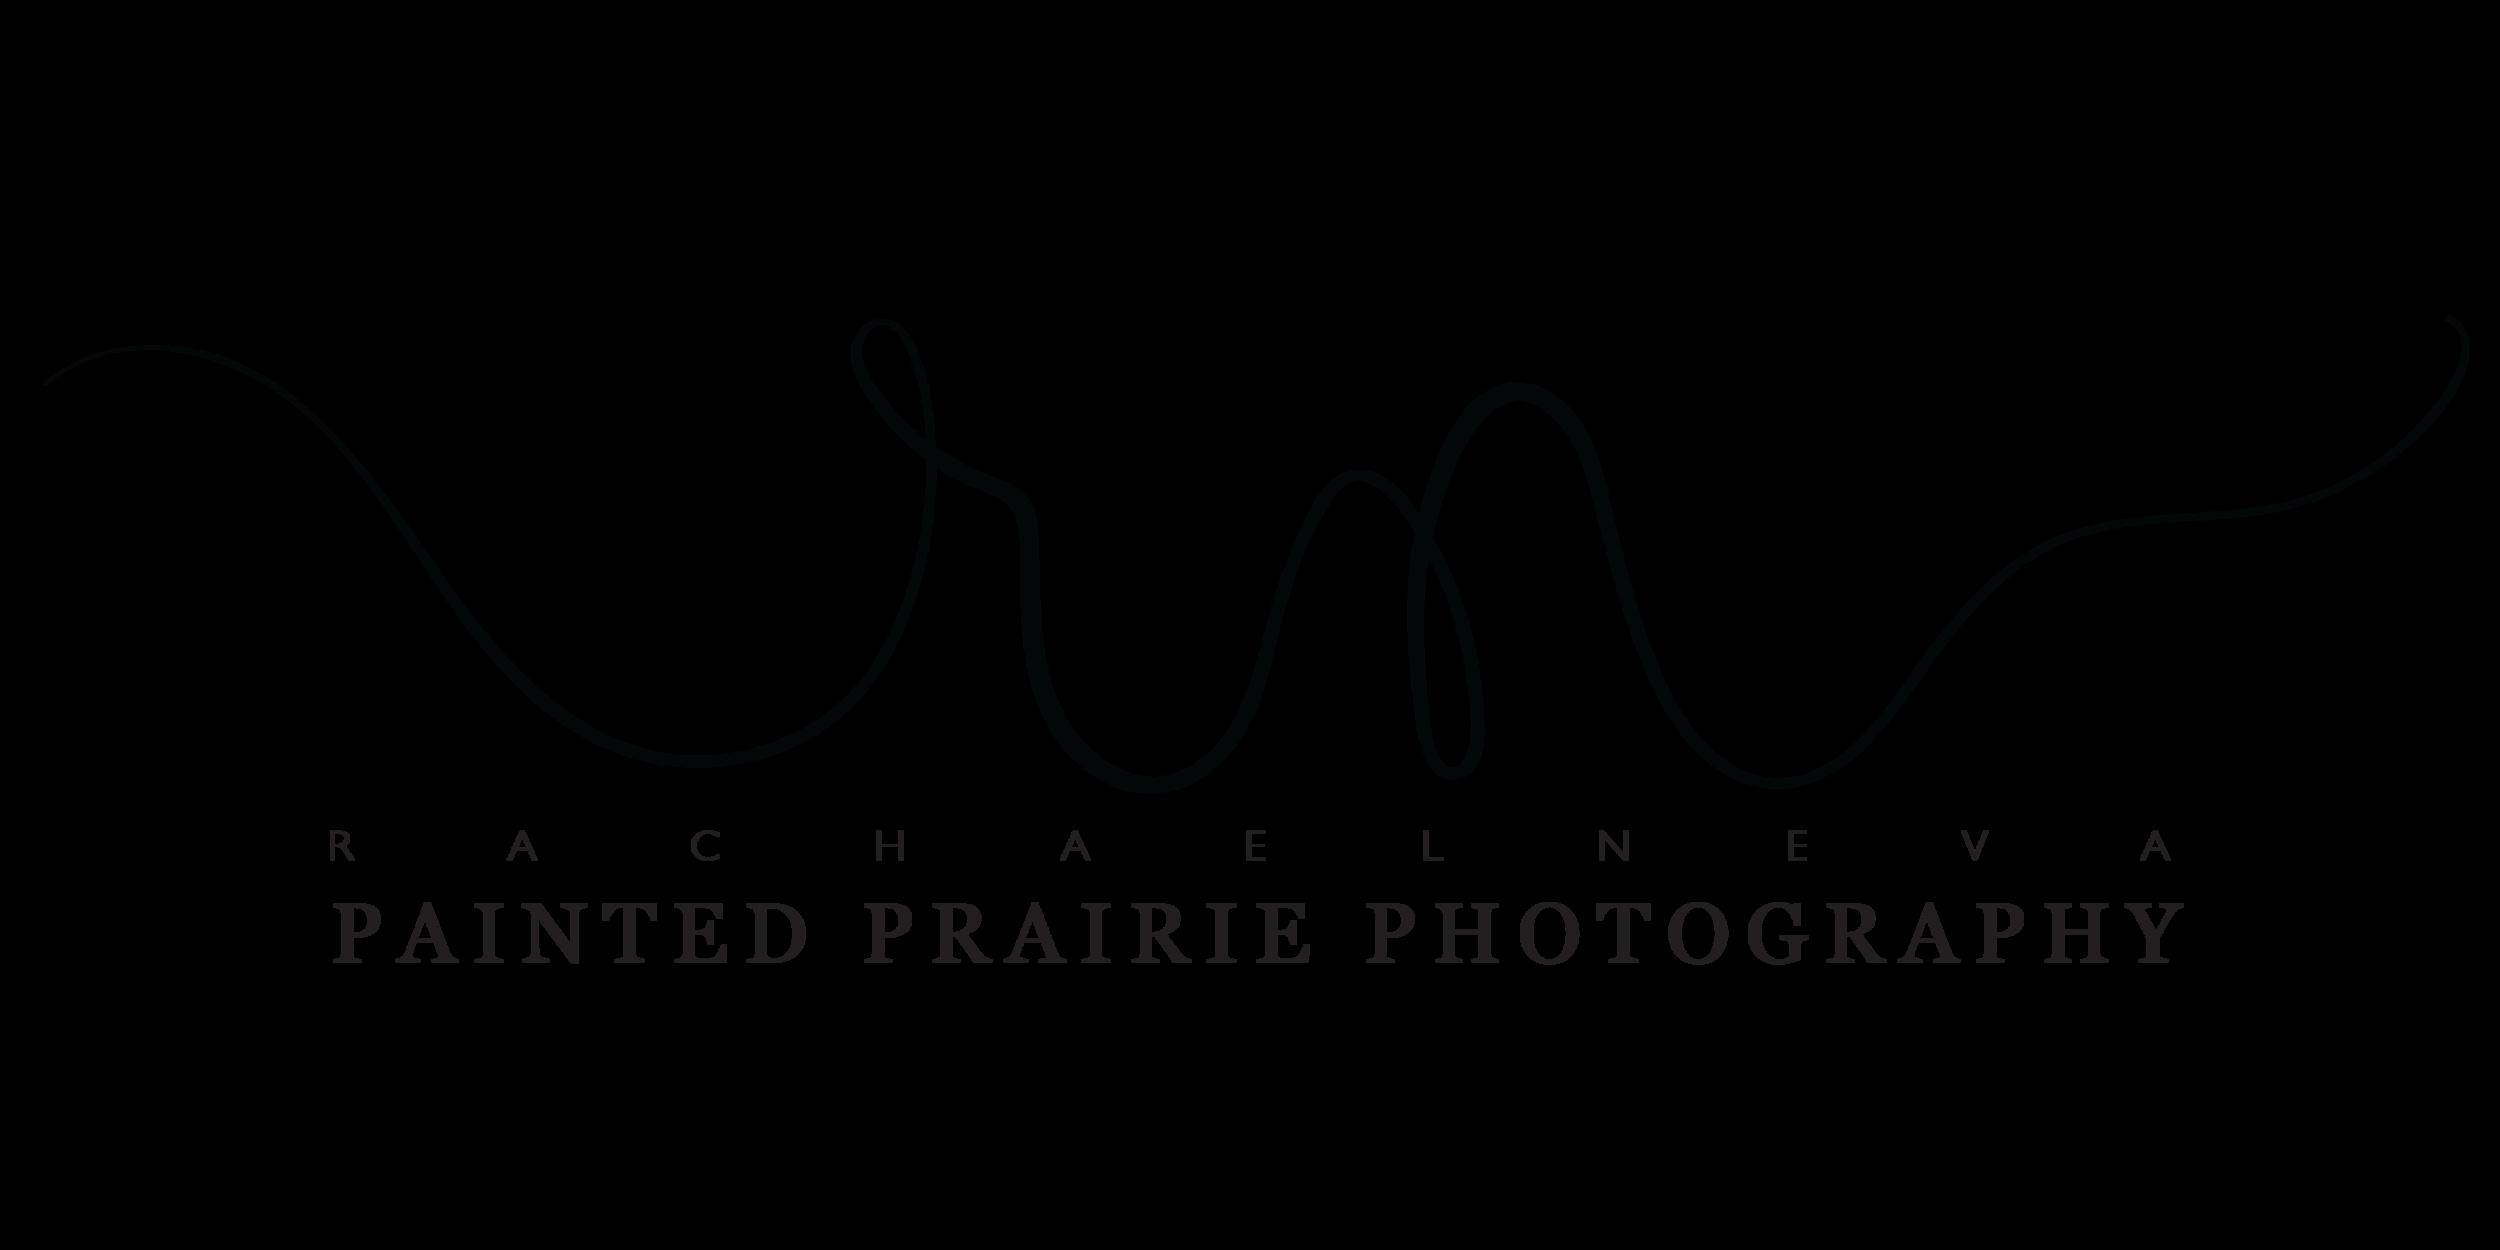 PAINTEDPRAIRIEPHOTOGRAPHY1.png